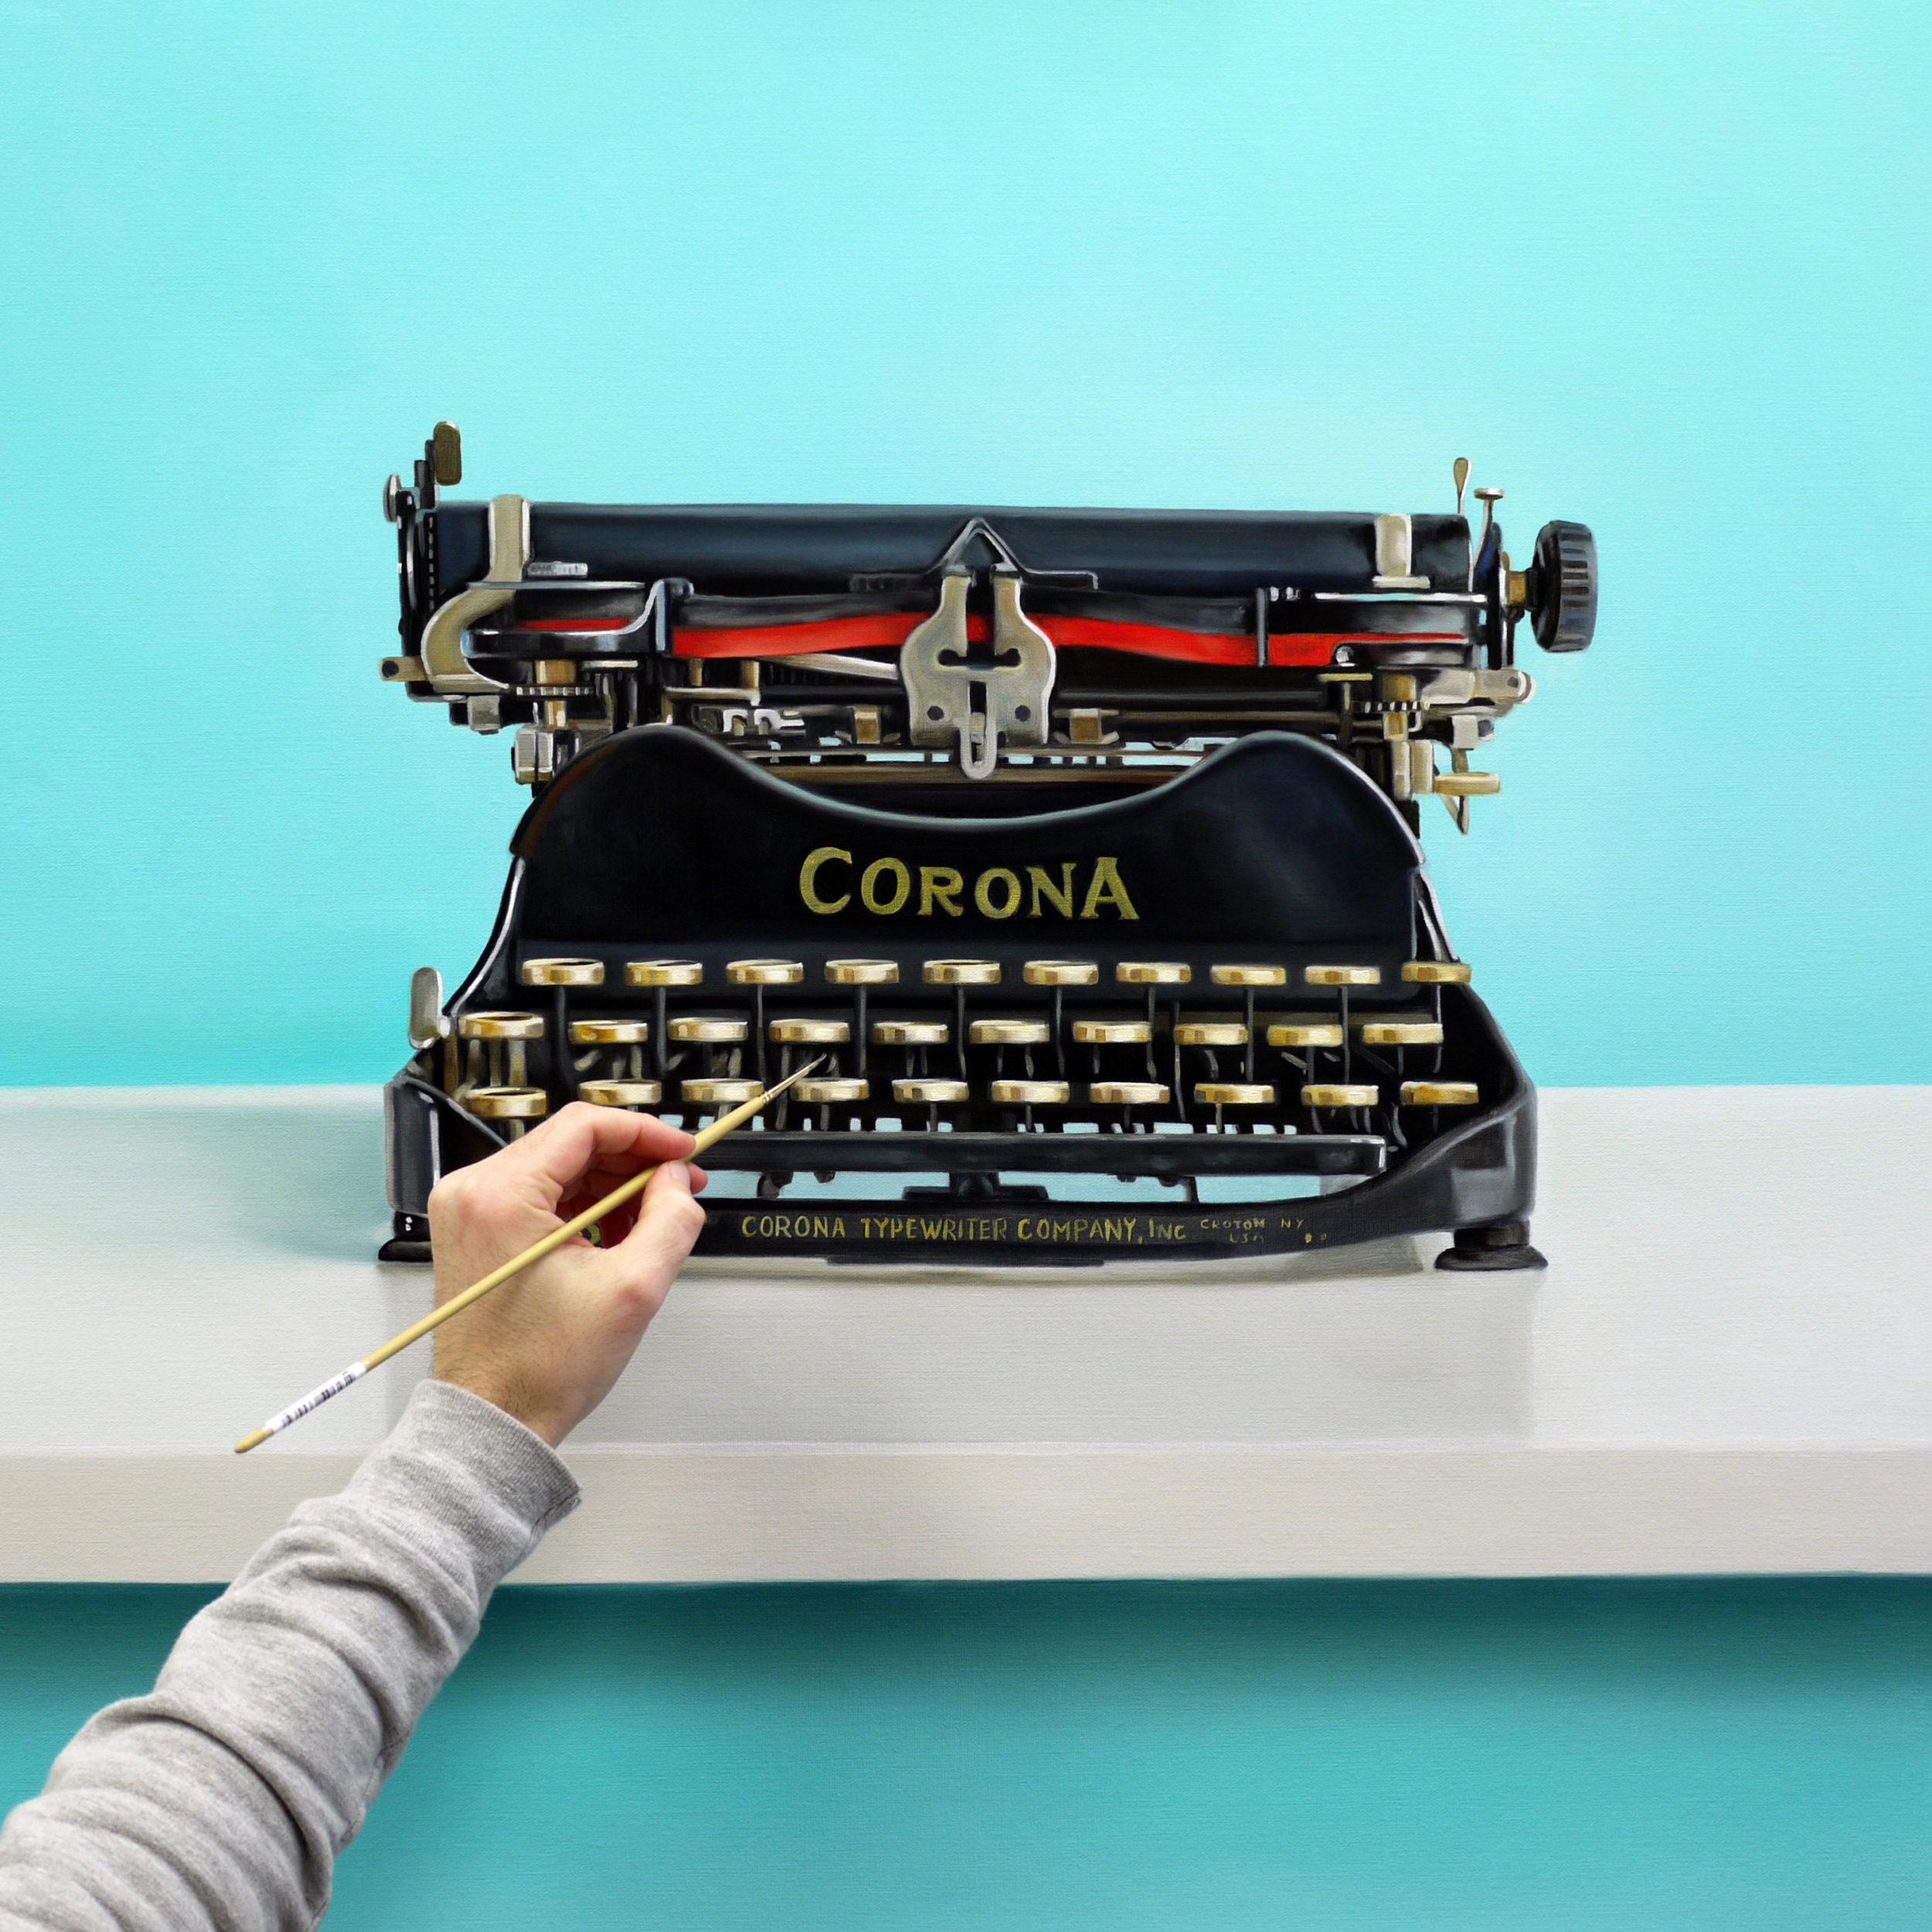 Corona Typewriter Painting Work in Progress by Christopher Stott